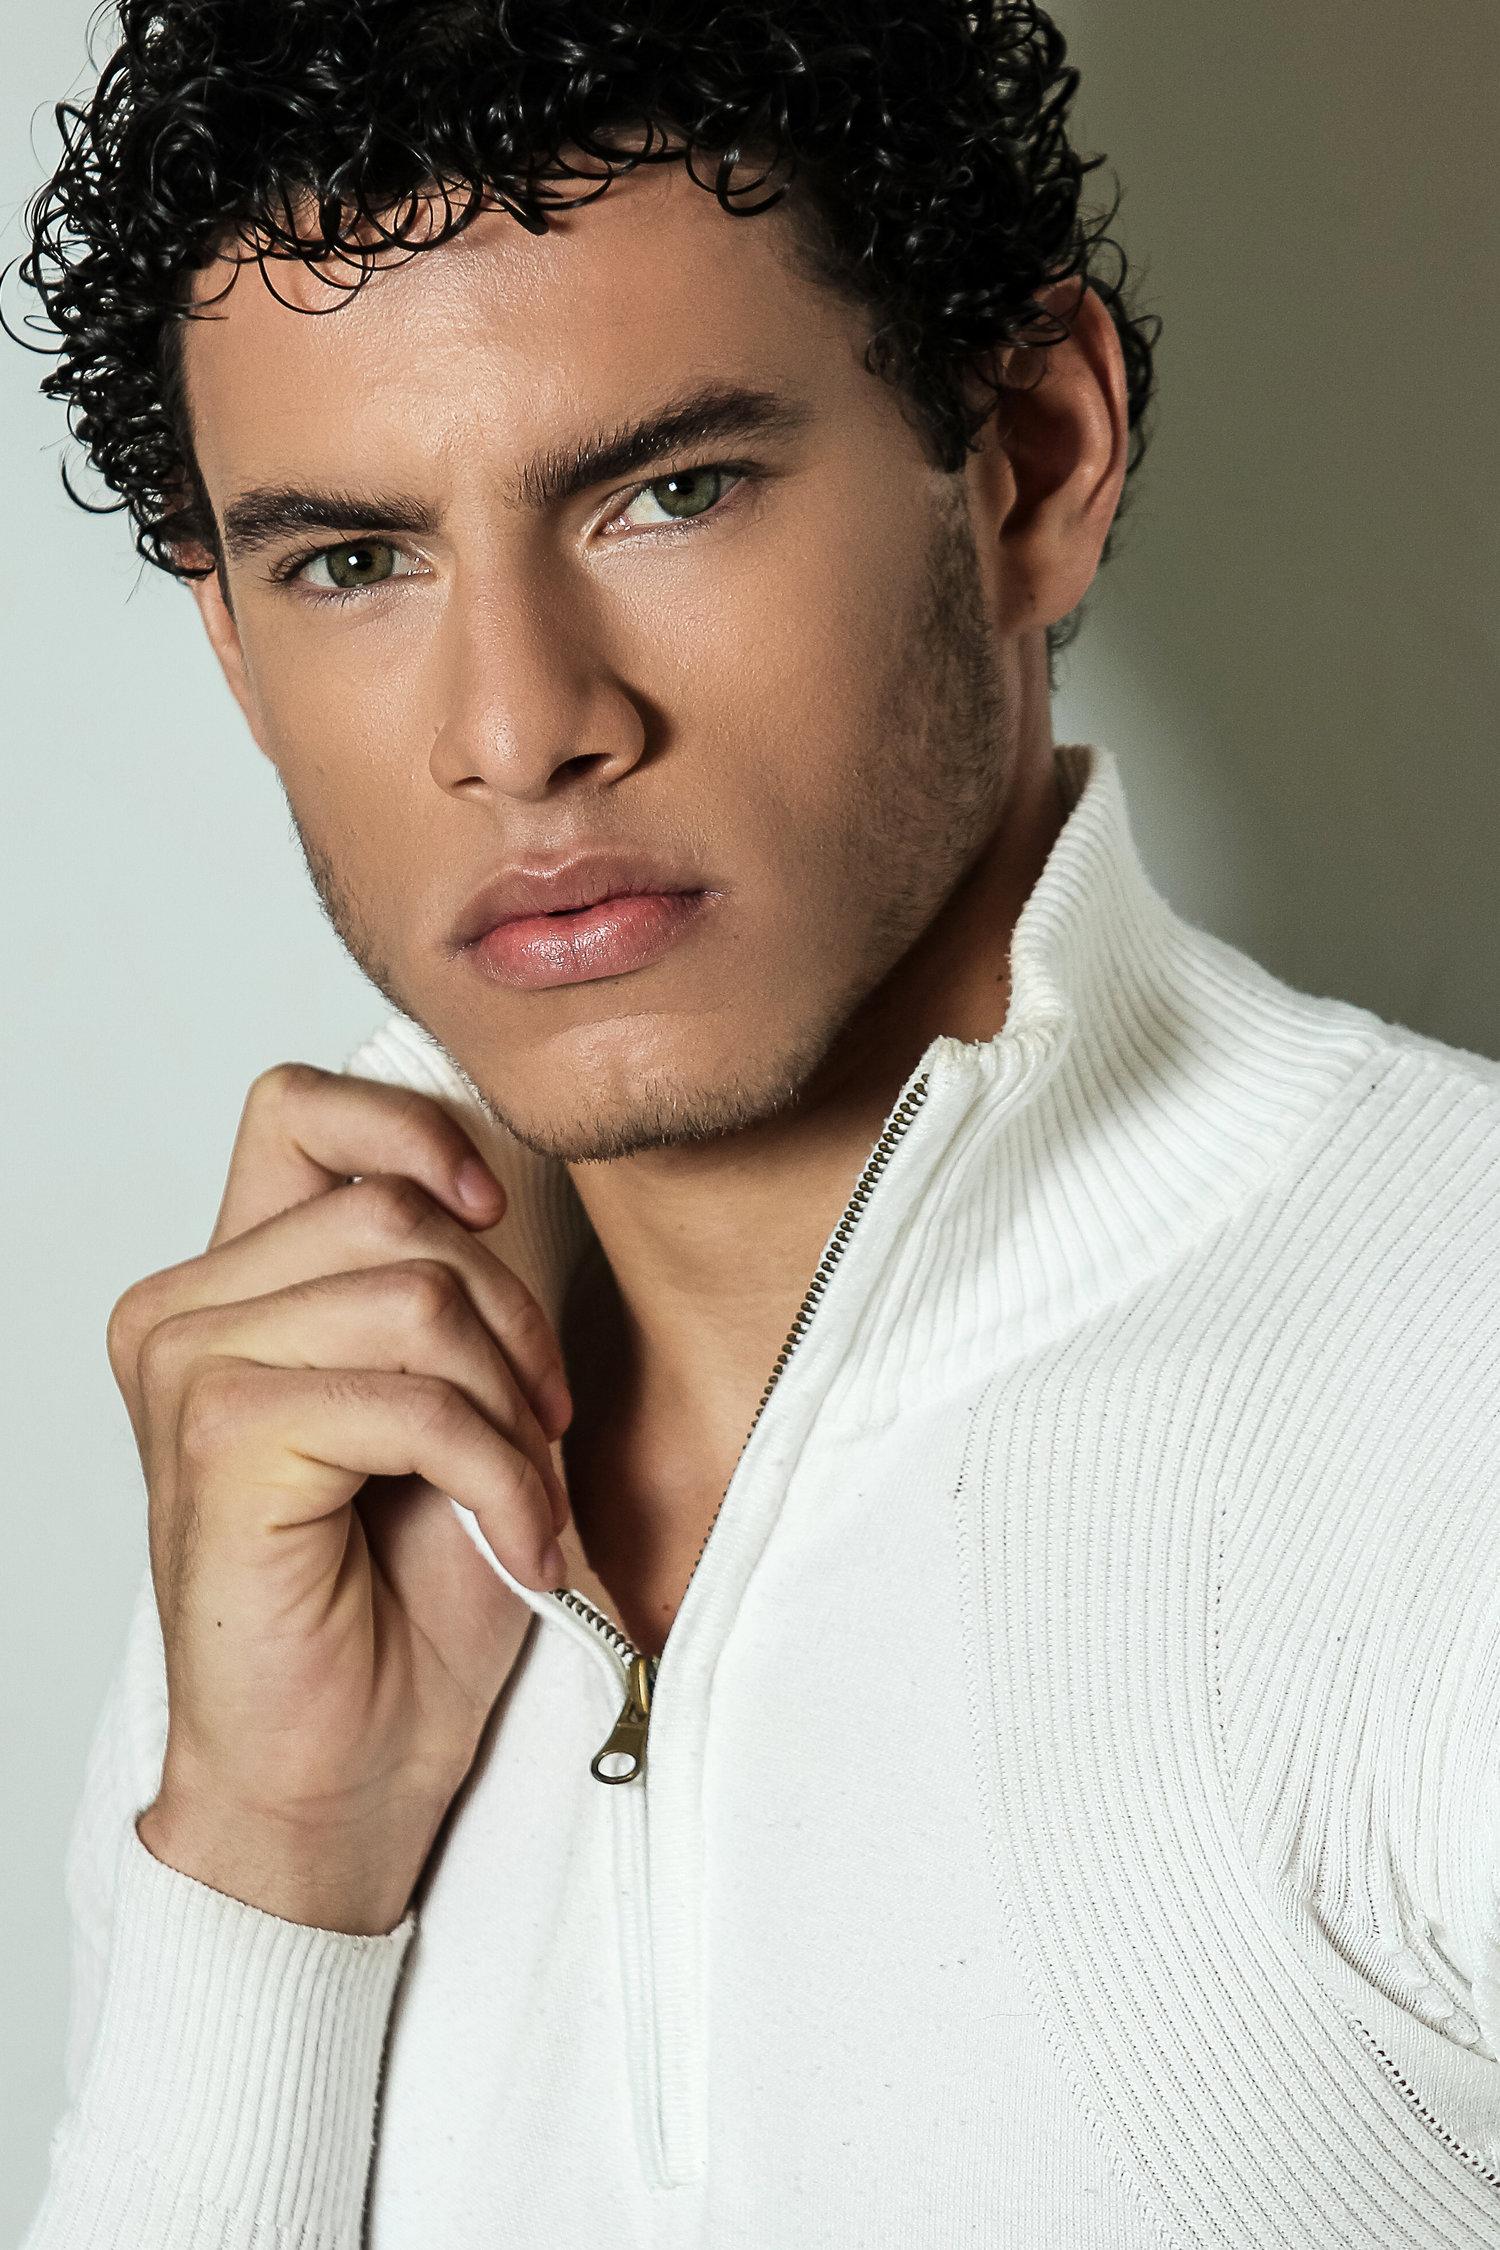 Adon Exclusive: Model Nathan Oliveira By Marcio Farias